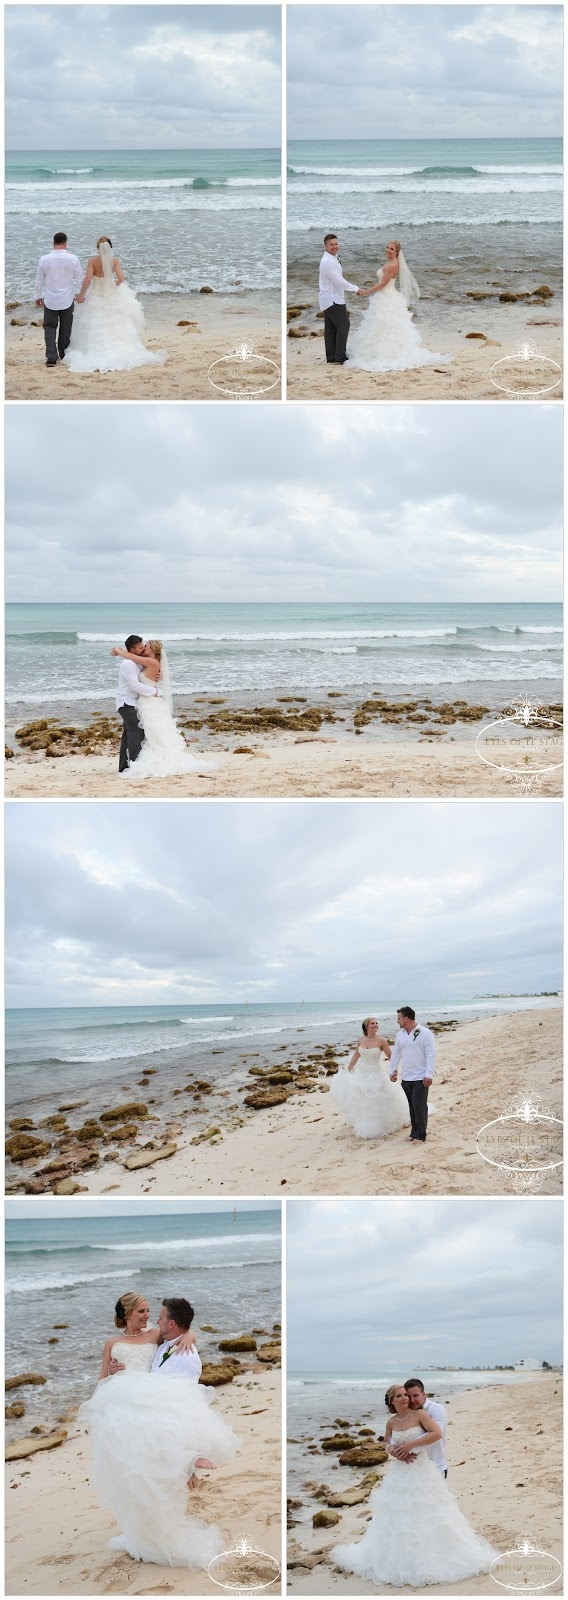 best beautiful images on pinterest perfect wedding wedding